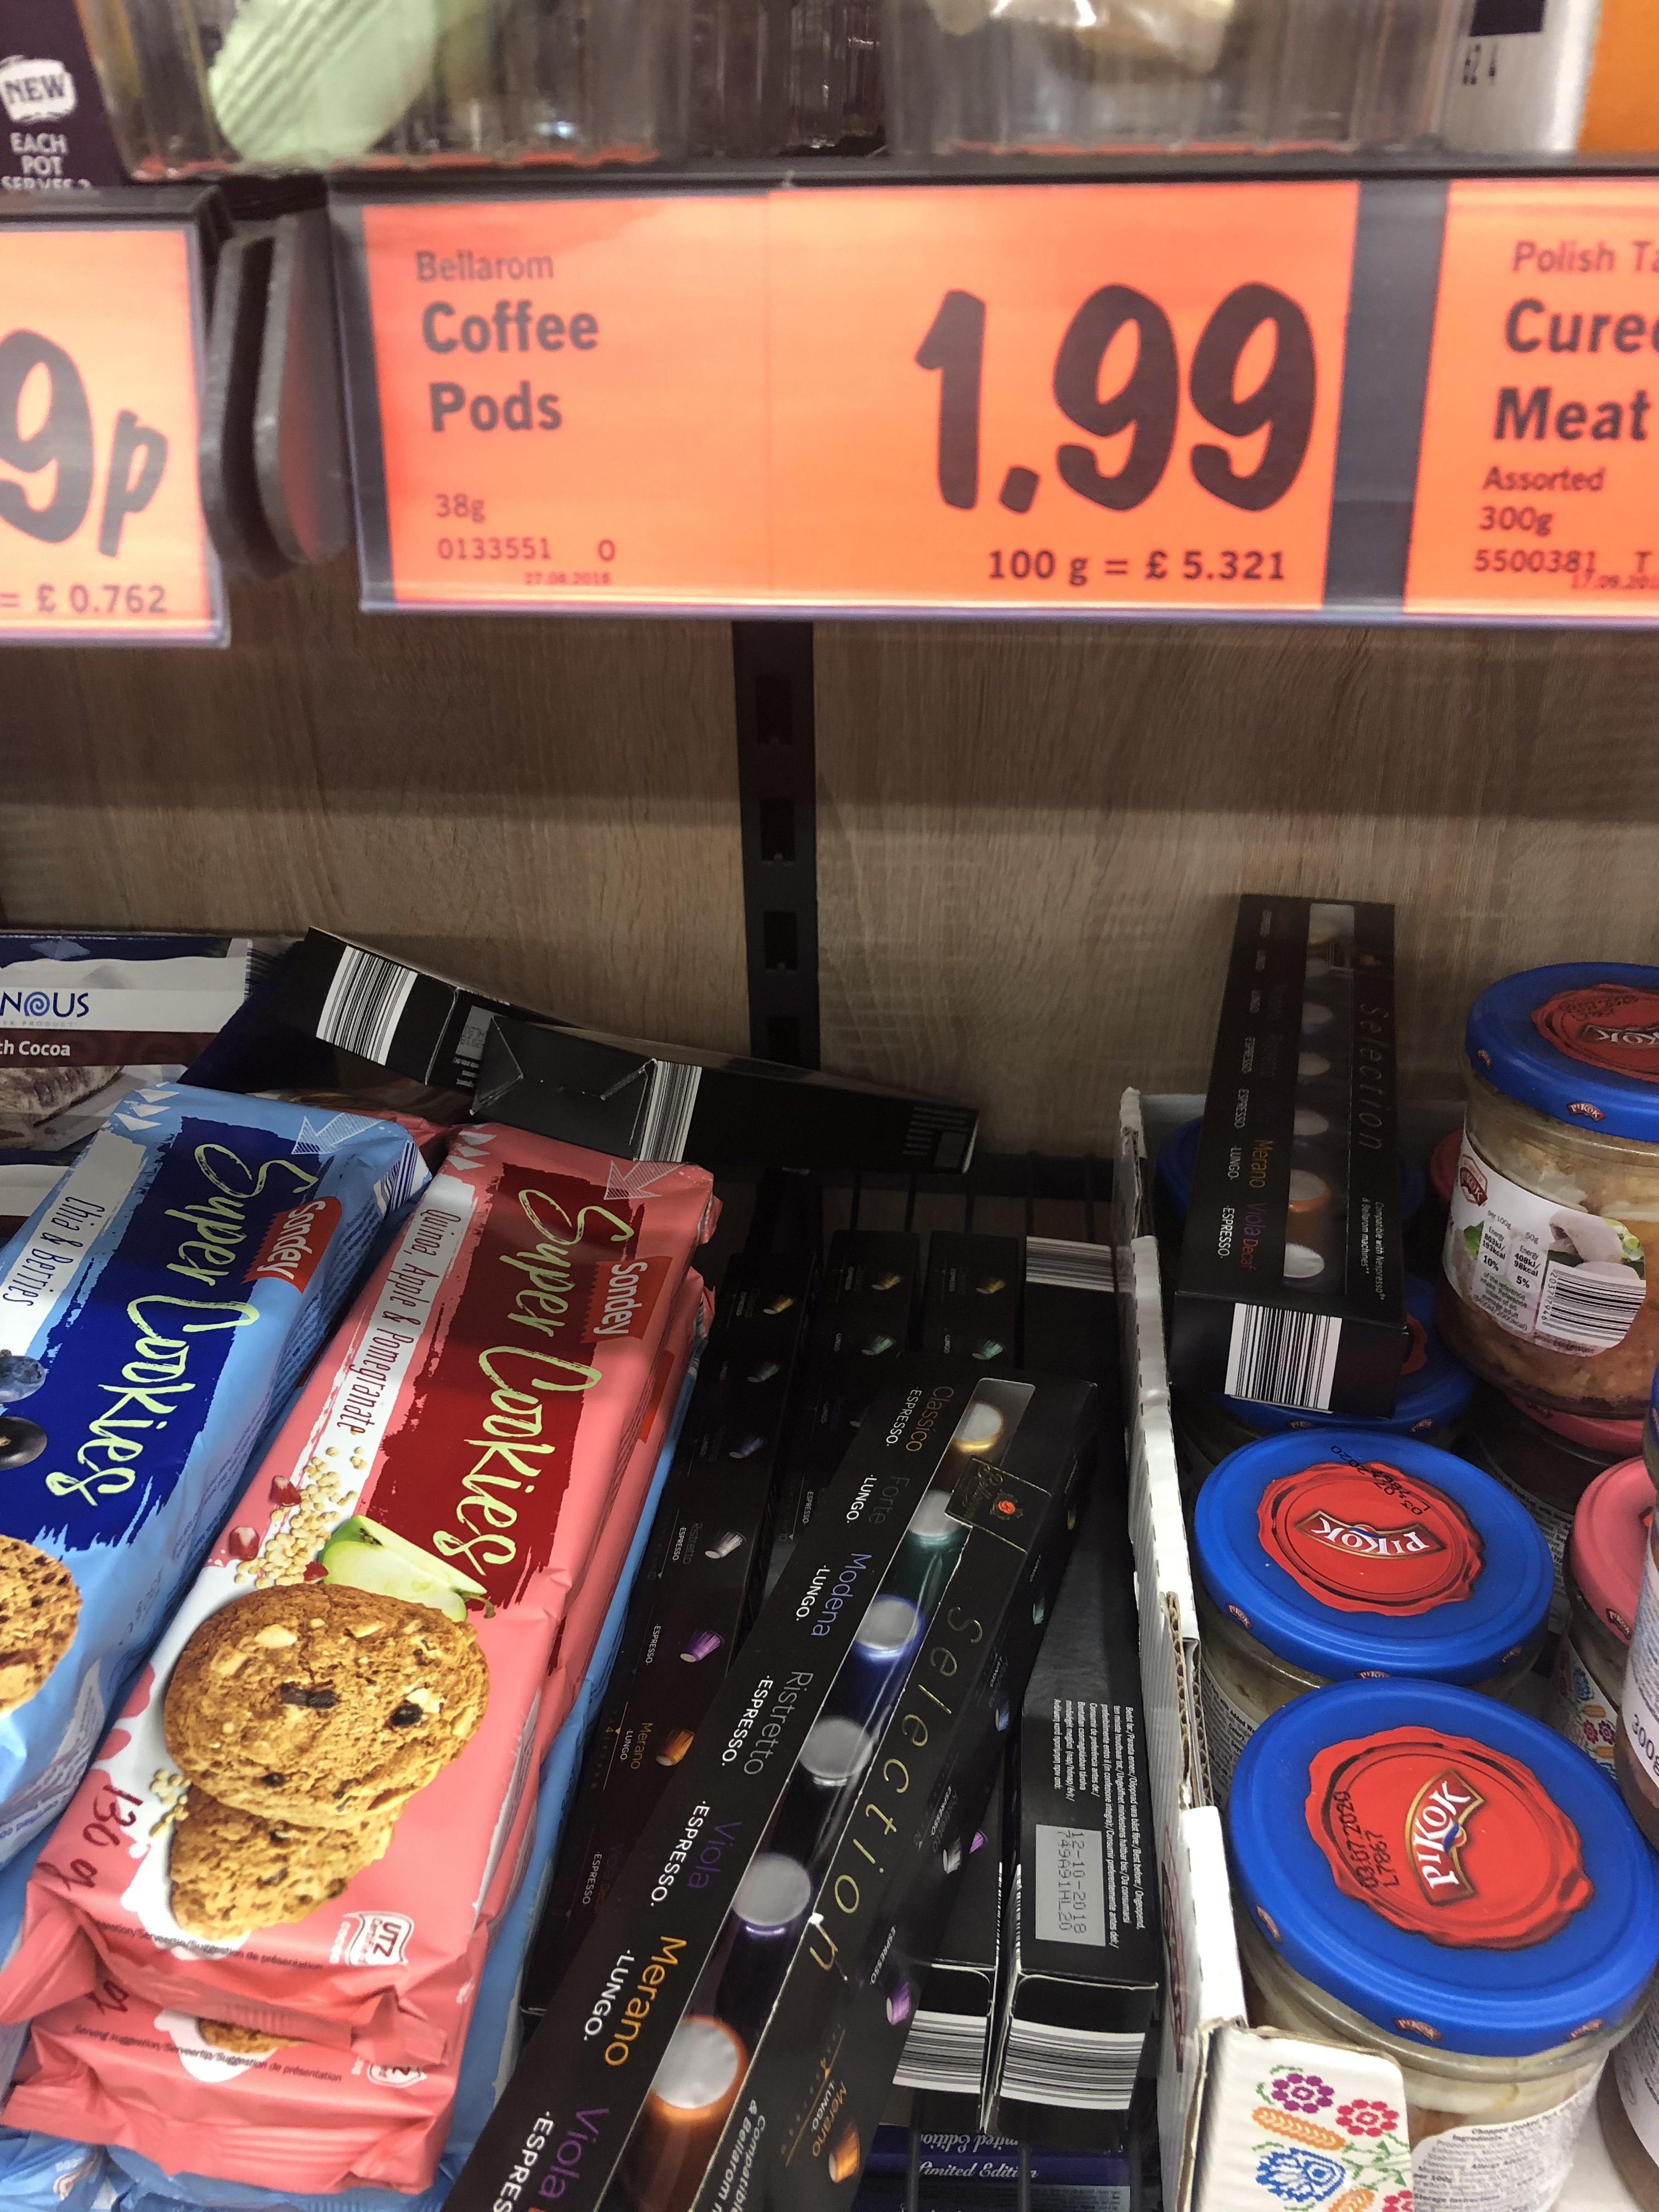 Nespresso compatible coffee pods BOGOF £1.99 @ Lidl